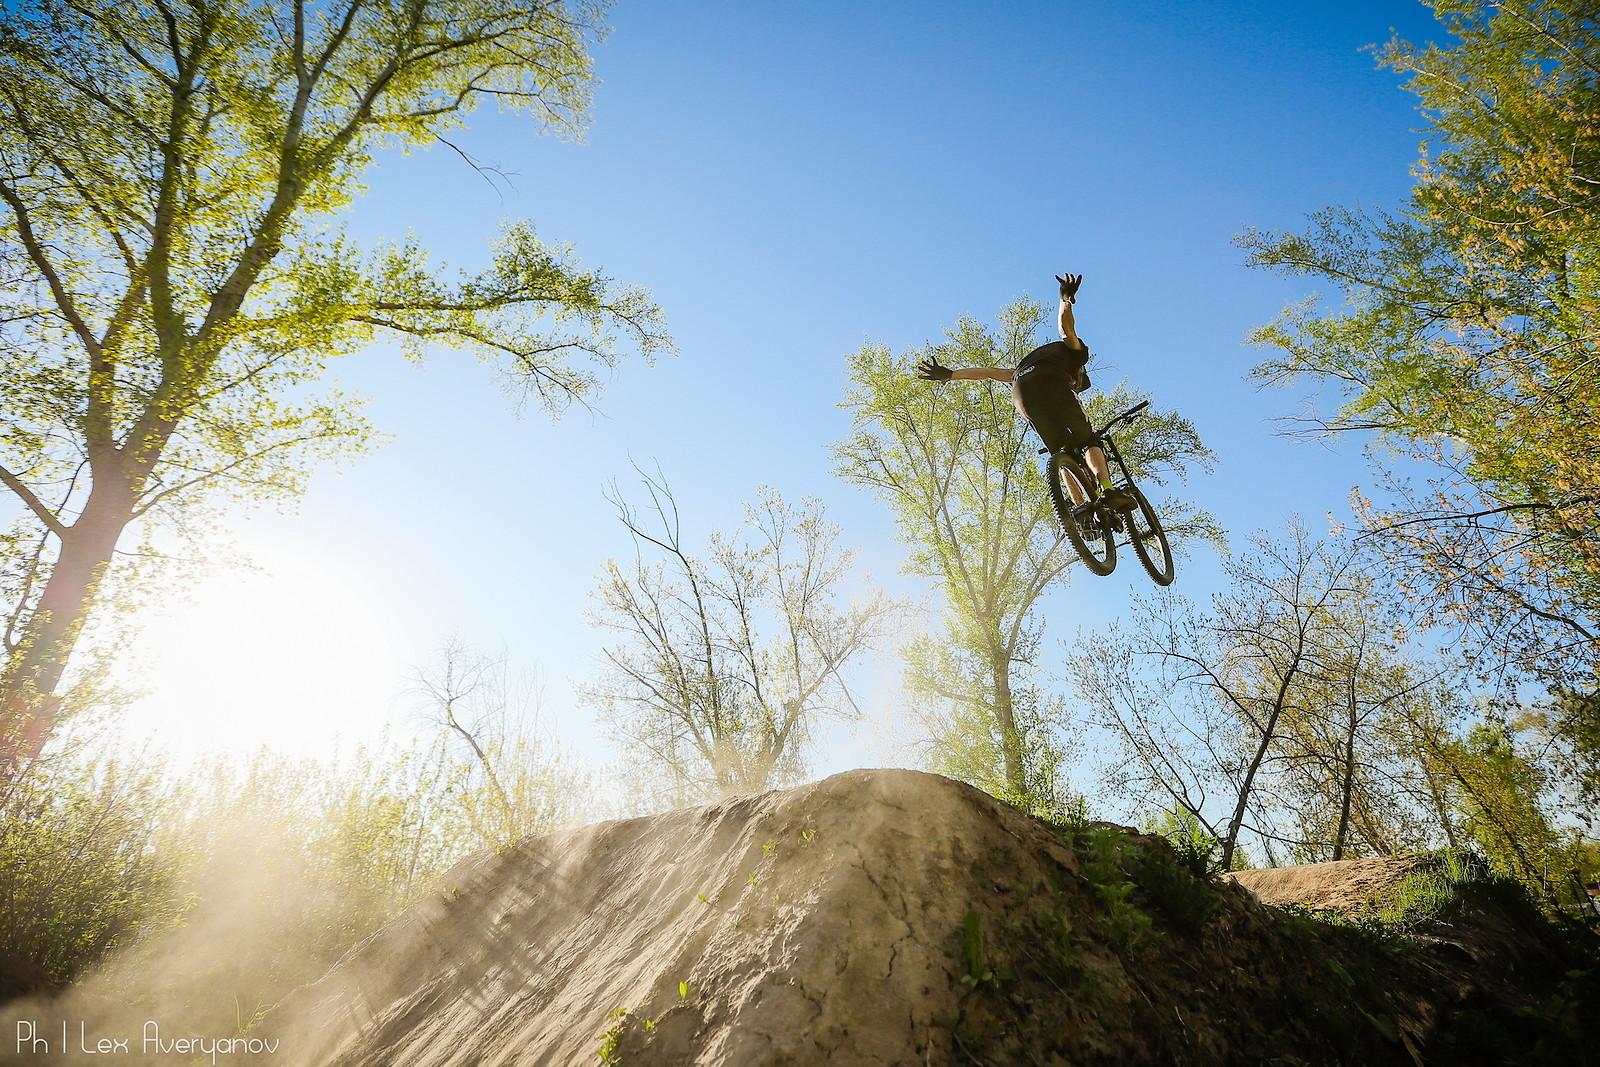 nohander - YakuT - Mountain Biking Pictures - Vital MTB